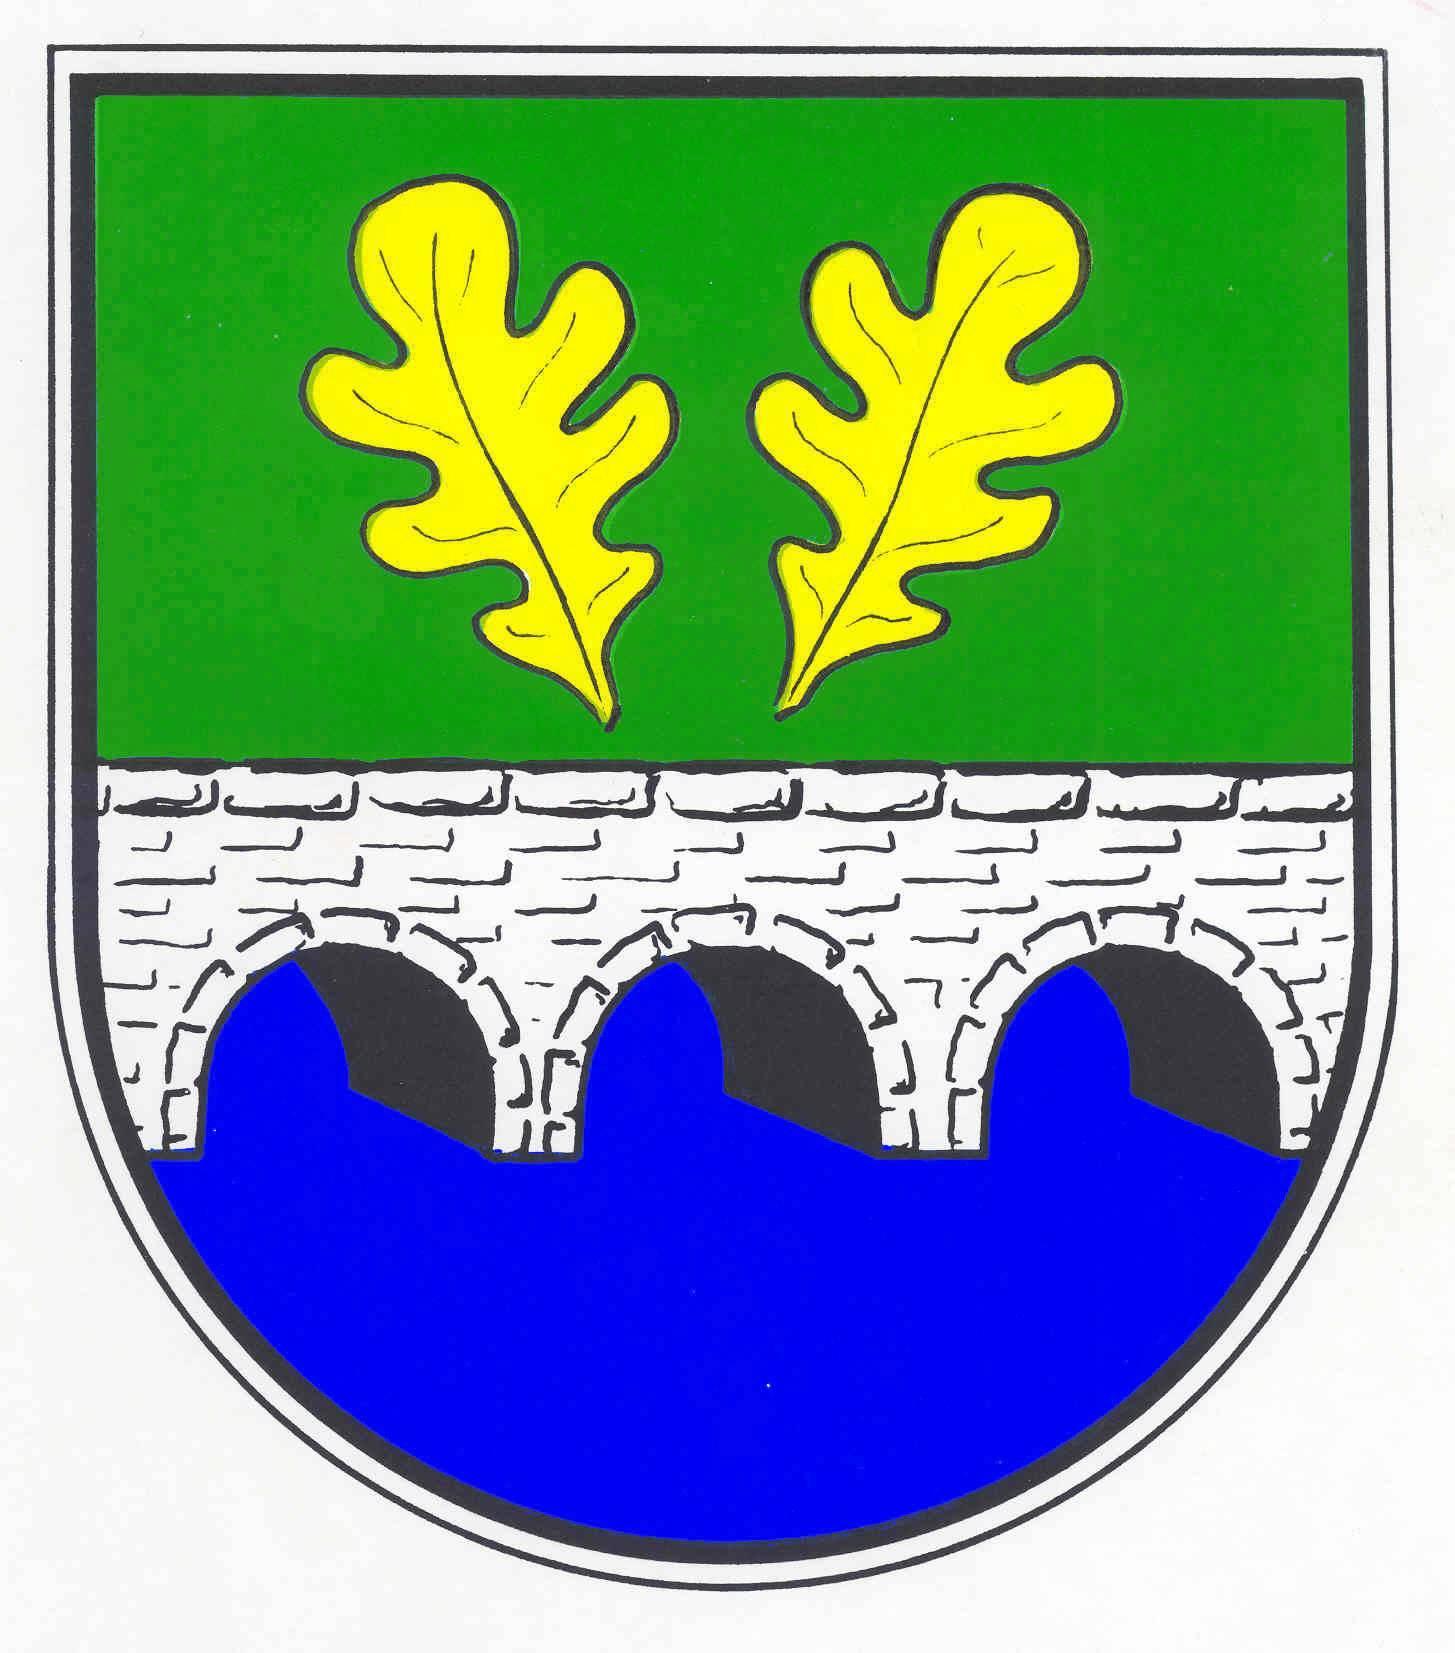 Wappen GemeindeSchmalfeld, Kreis Segeberg